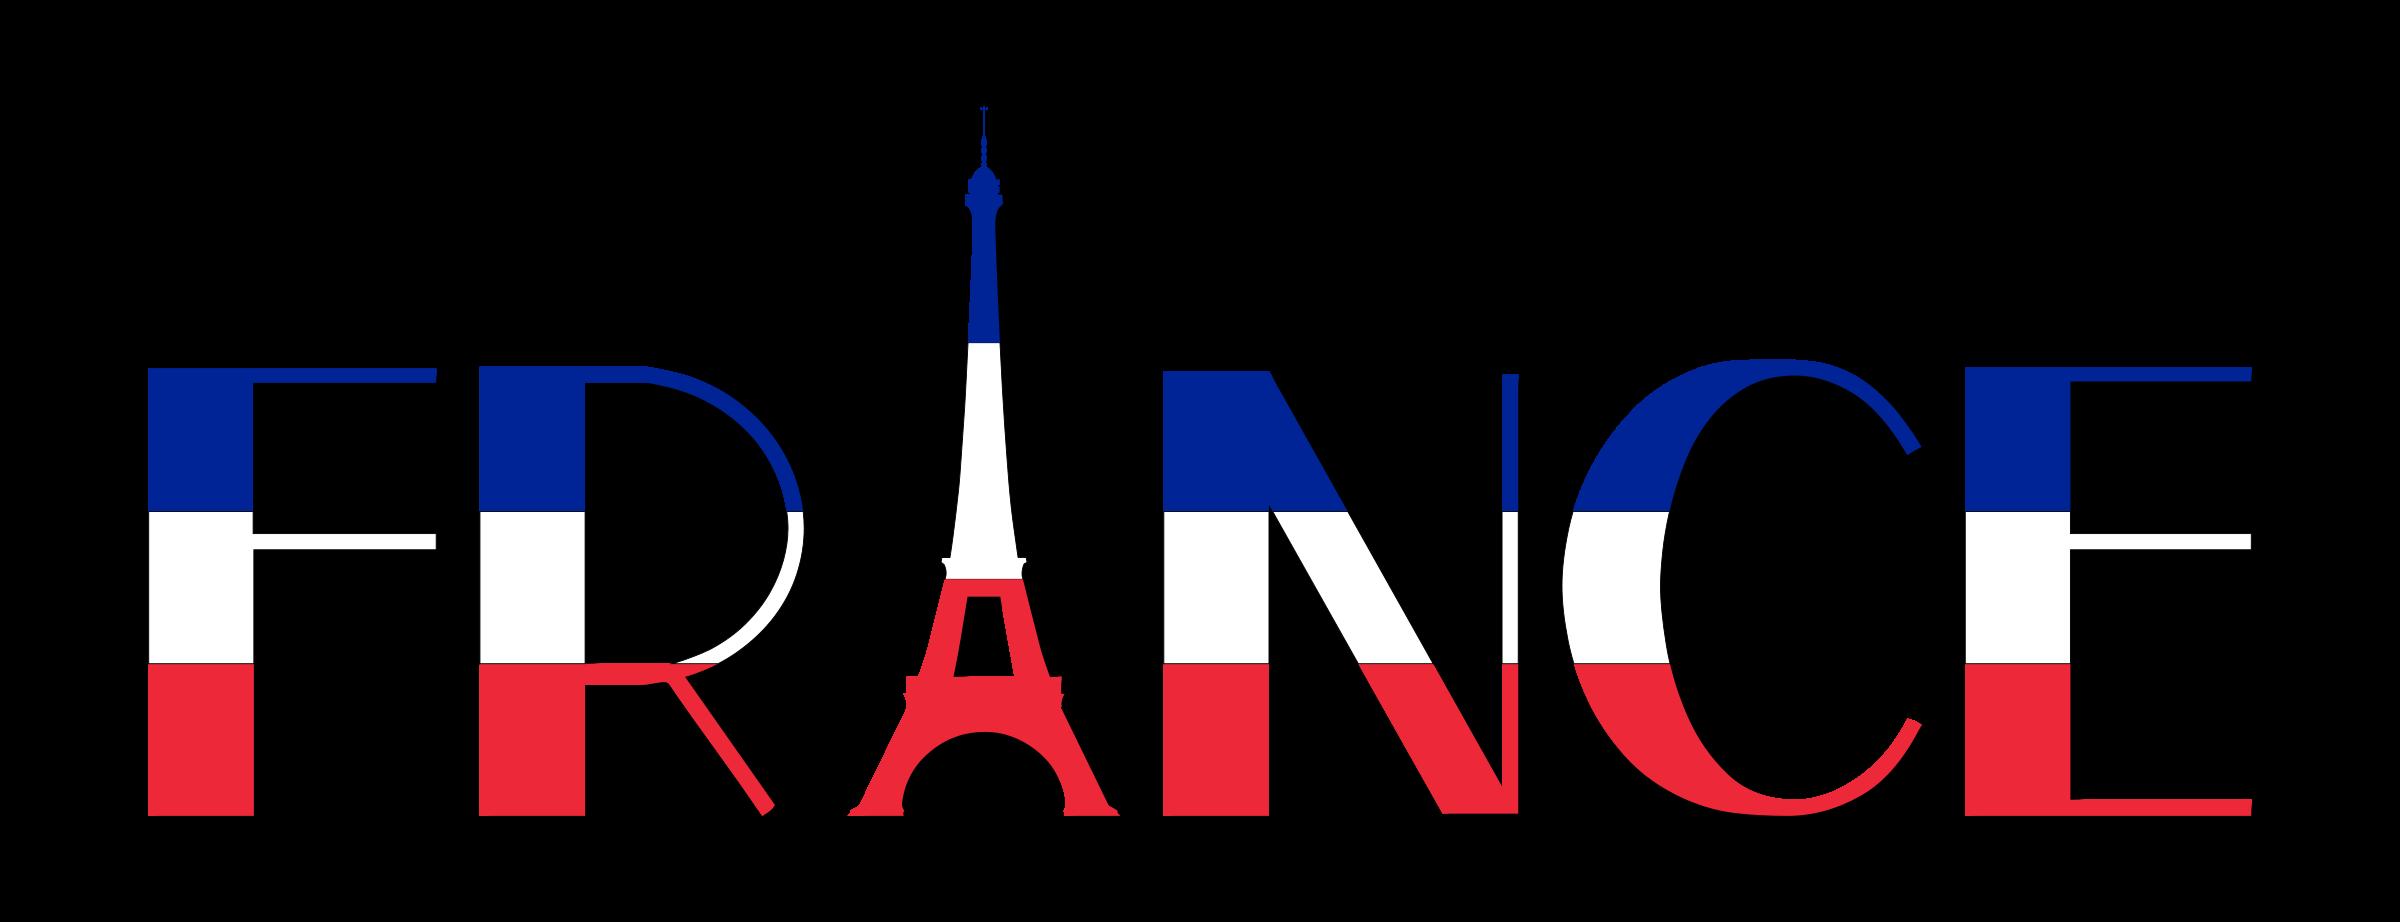 2400x922 France Clipart France